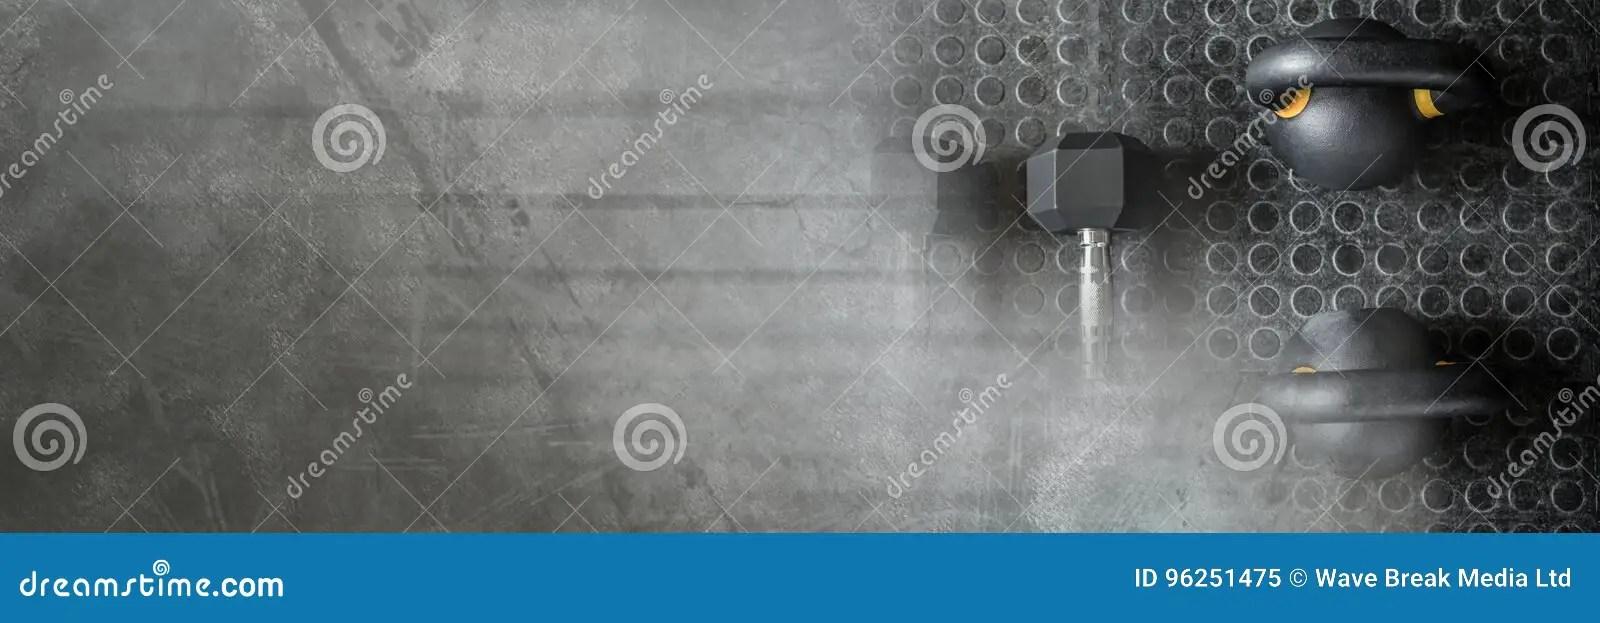 kettlebells et halteres dans le gymnase avec la transition foncee